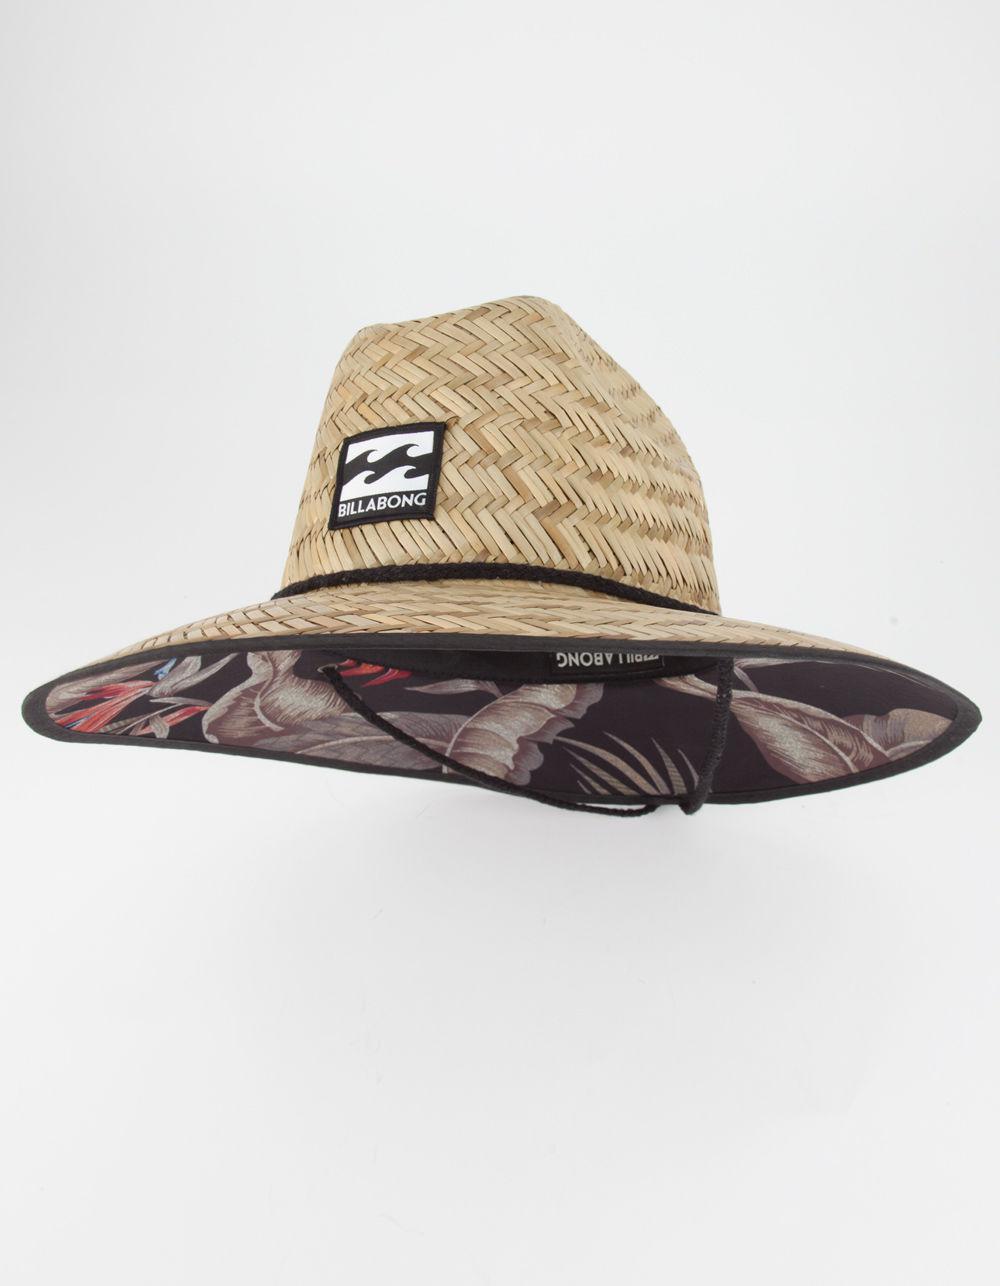 Lyst - Billabong Tides Lifeguard Hat in Natural for Men 9f997dbdfe2